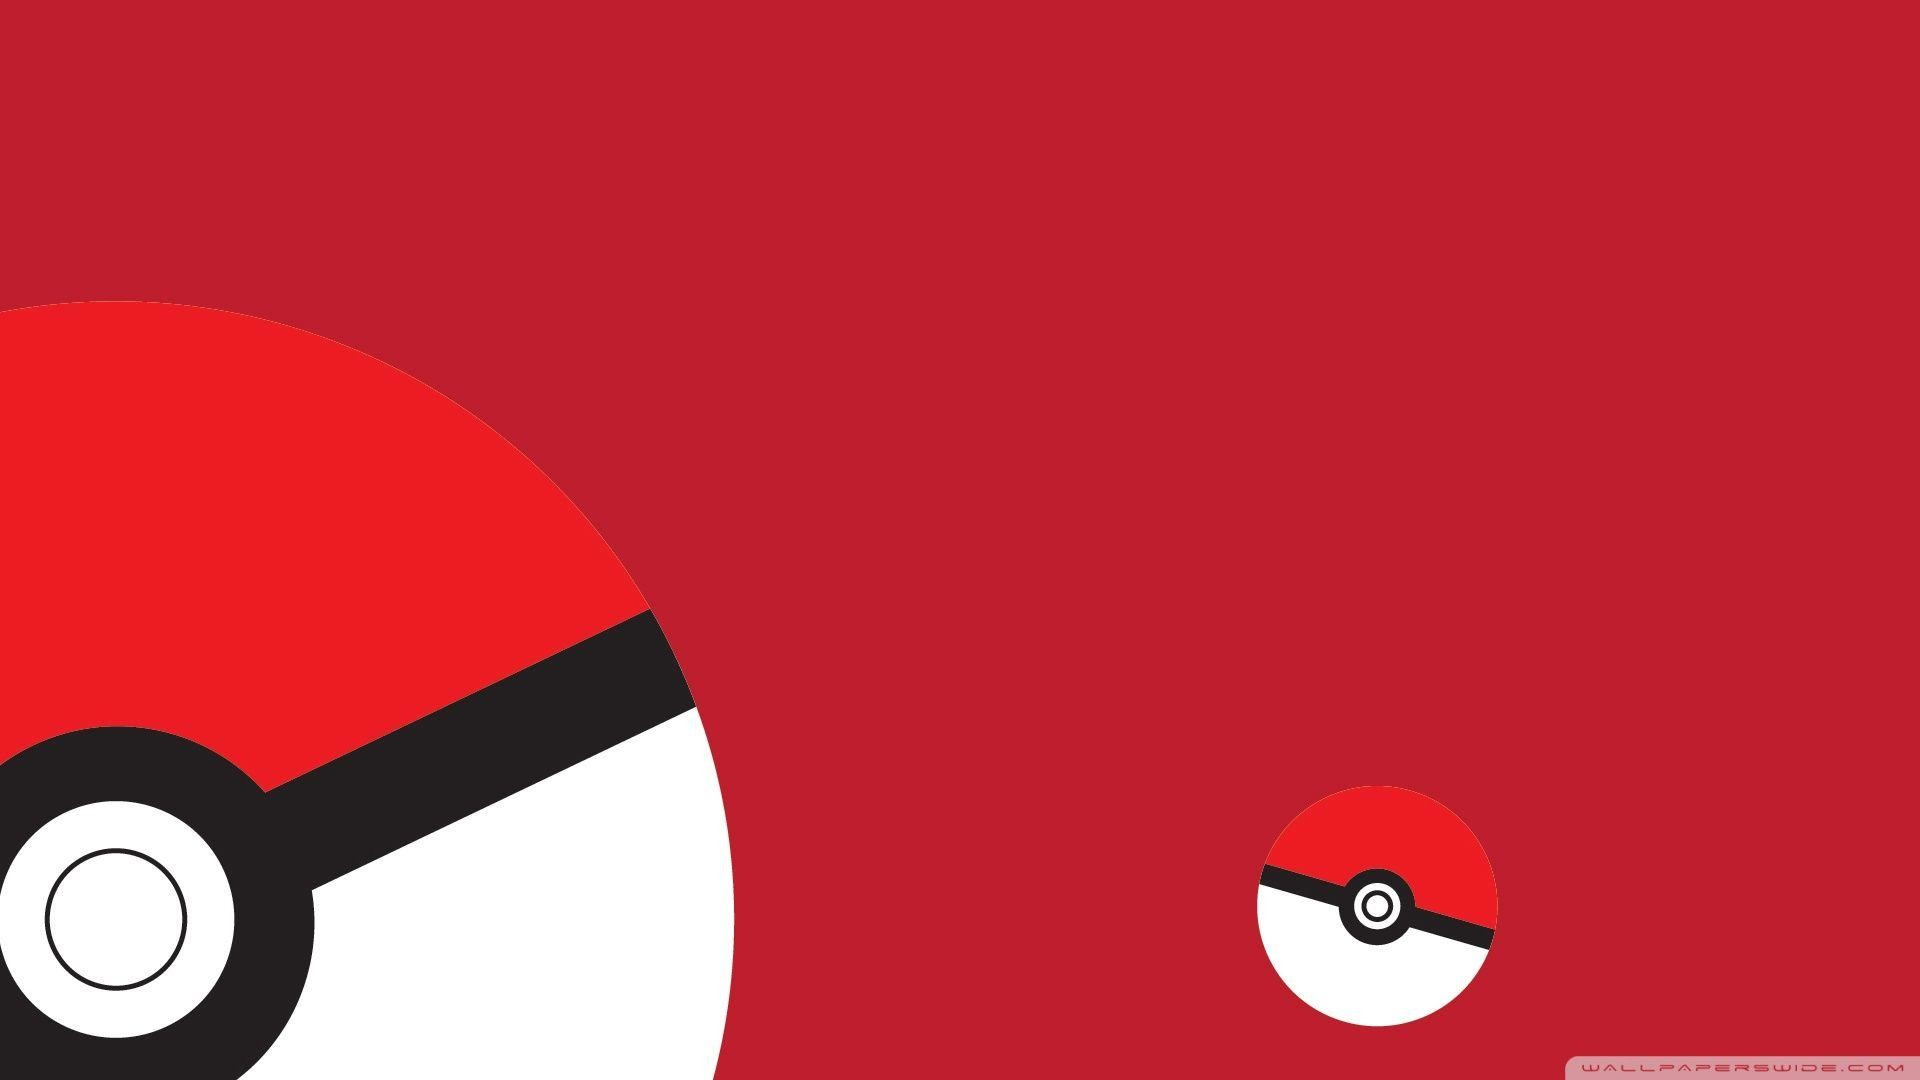 Pokemon Background Pokeball wallpaper – 932274